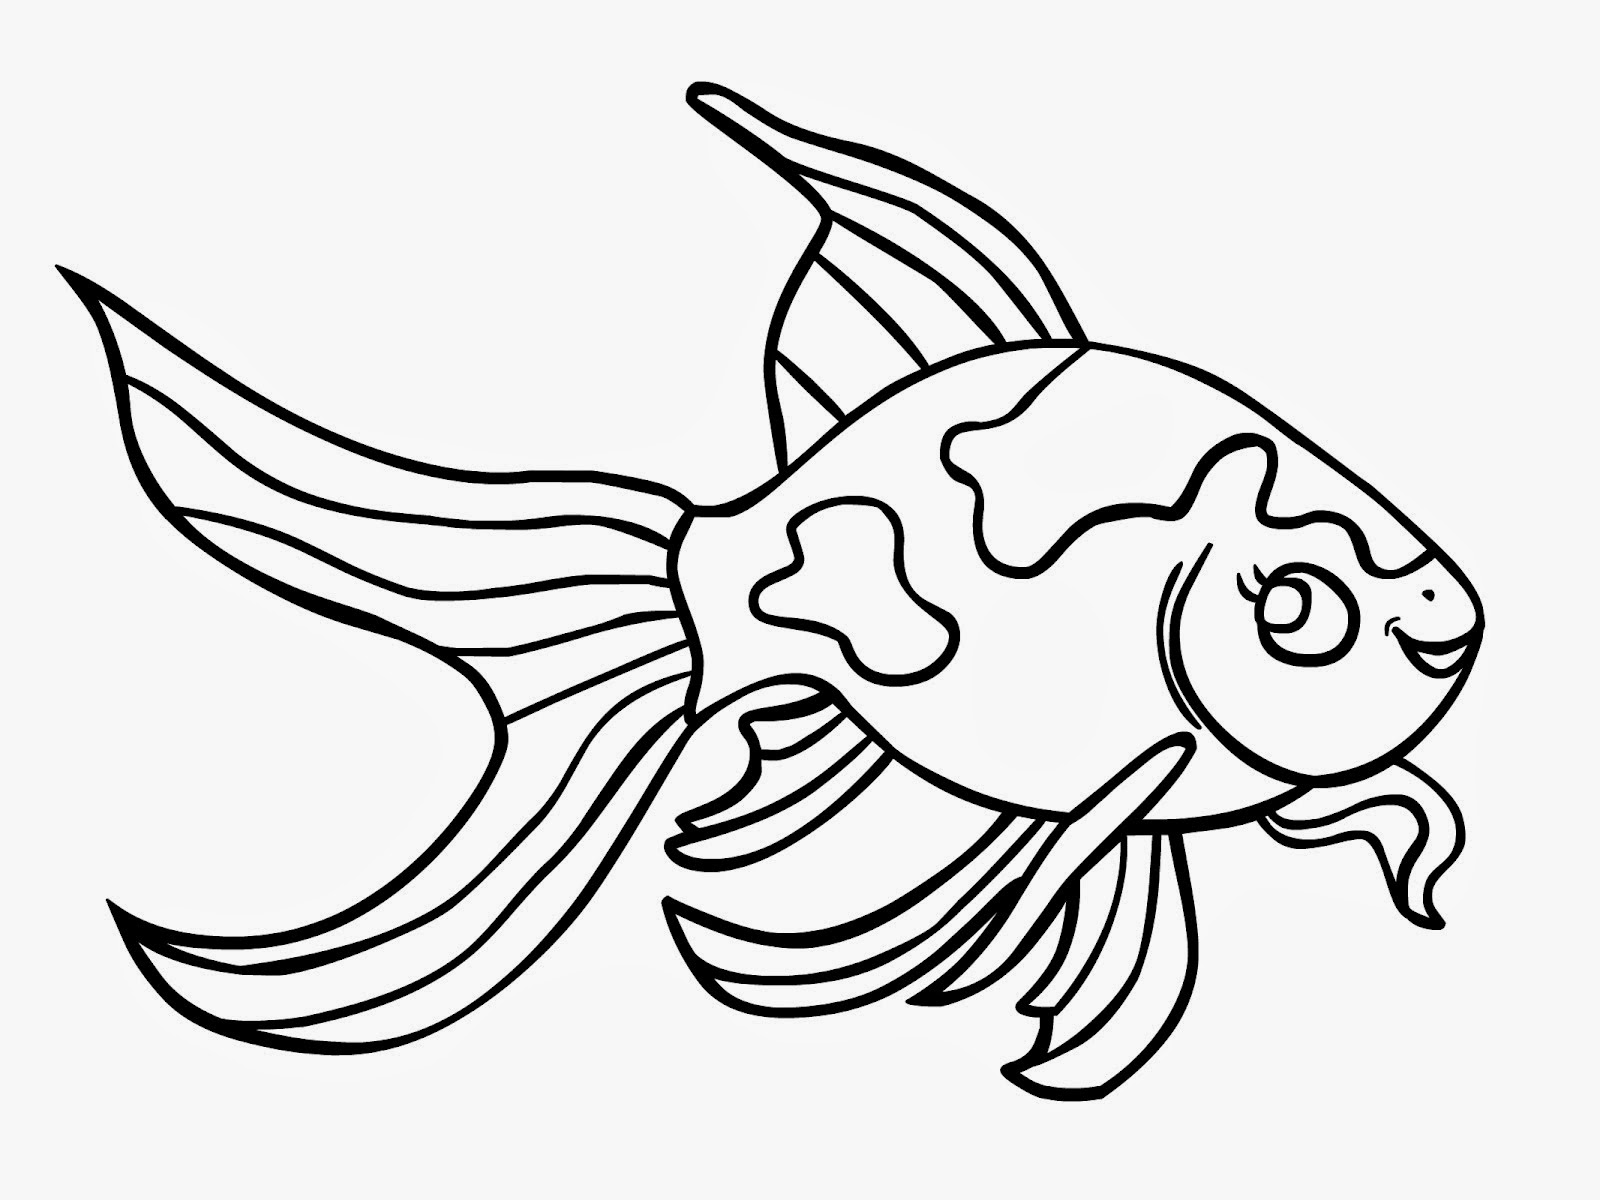 Goldfish clipart black and white